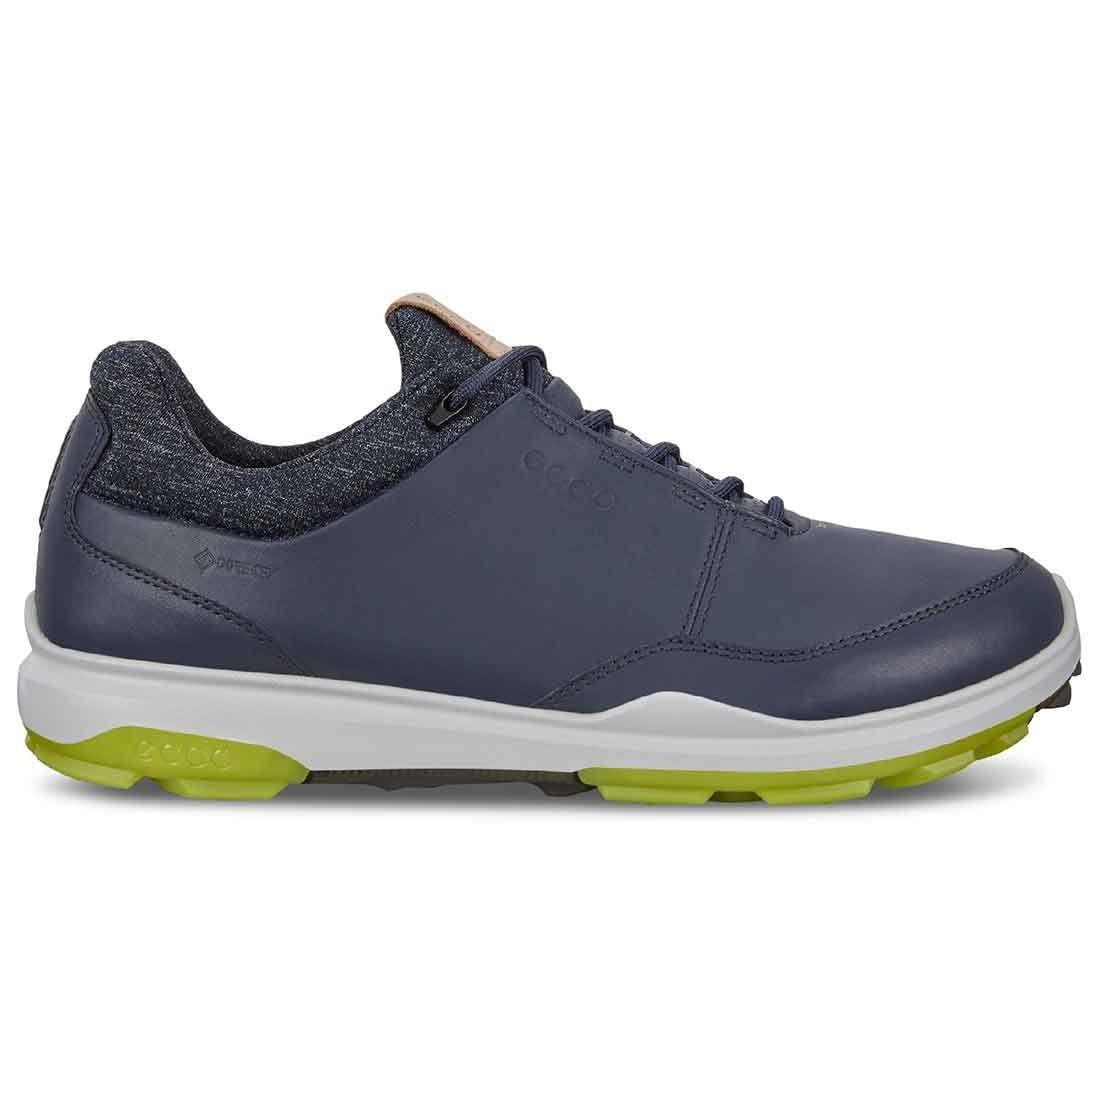 Buy Ecco Biom Hybrid 3 Gtx Golf Shoes Navy Lime Golf Discount